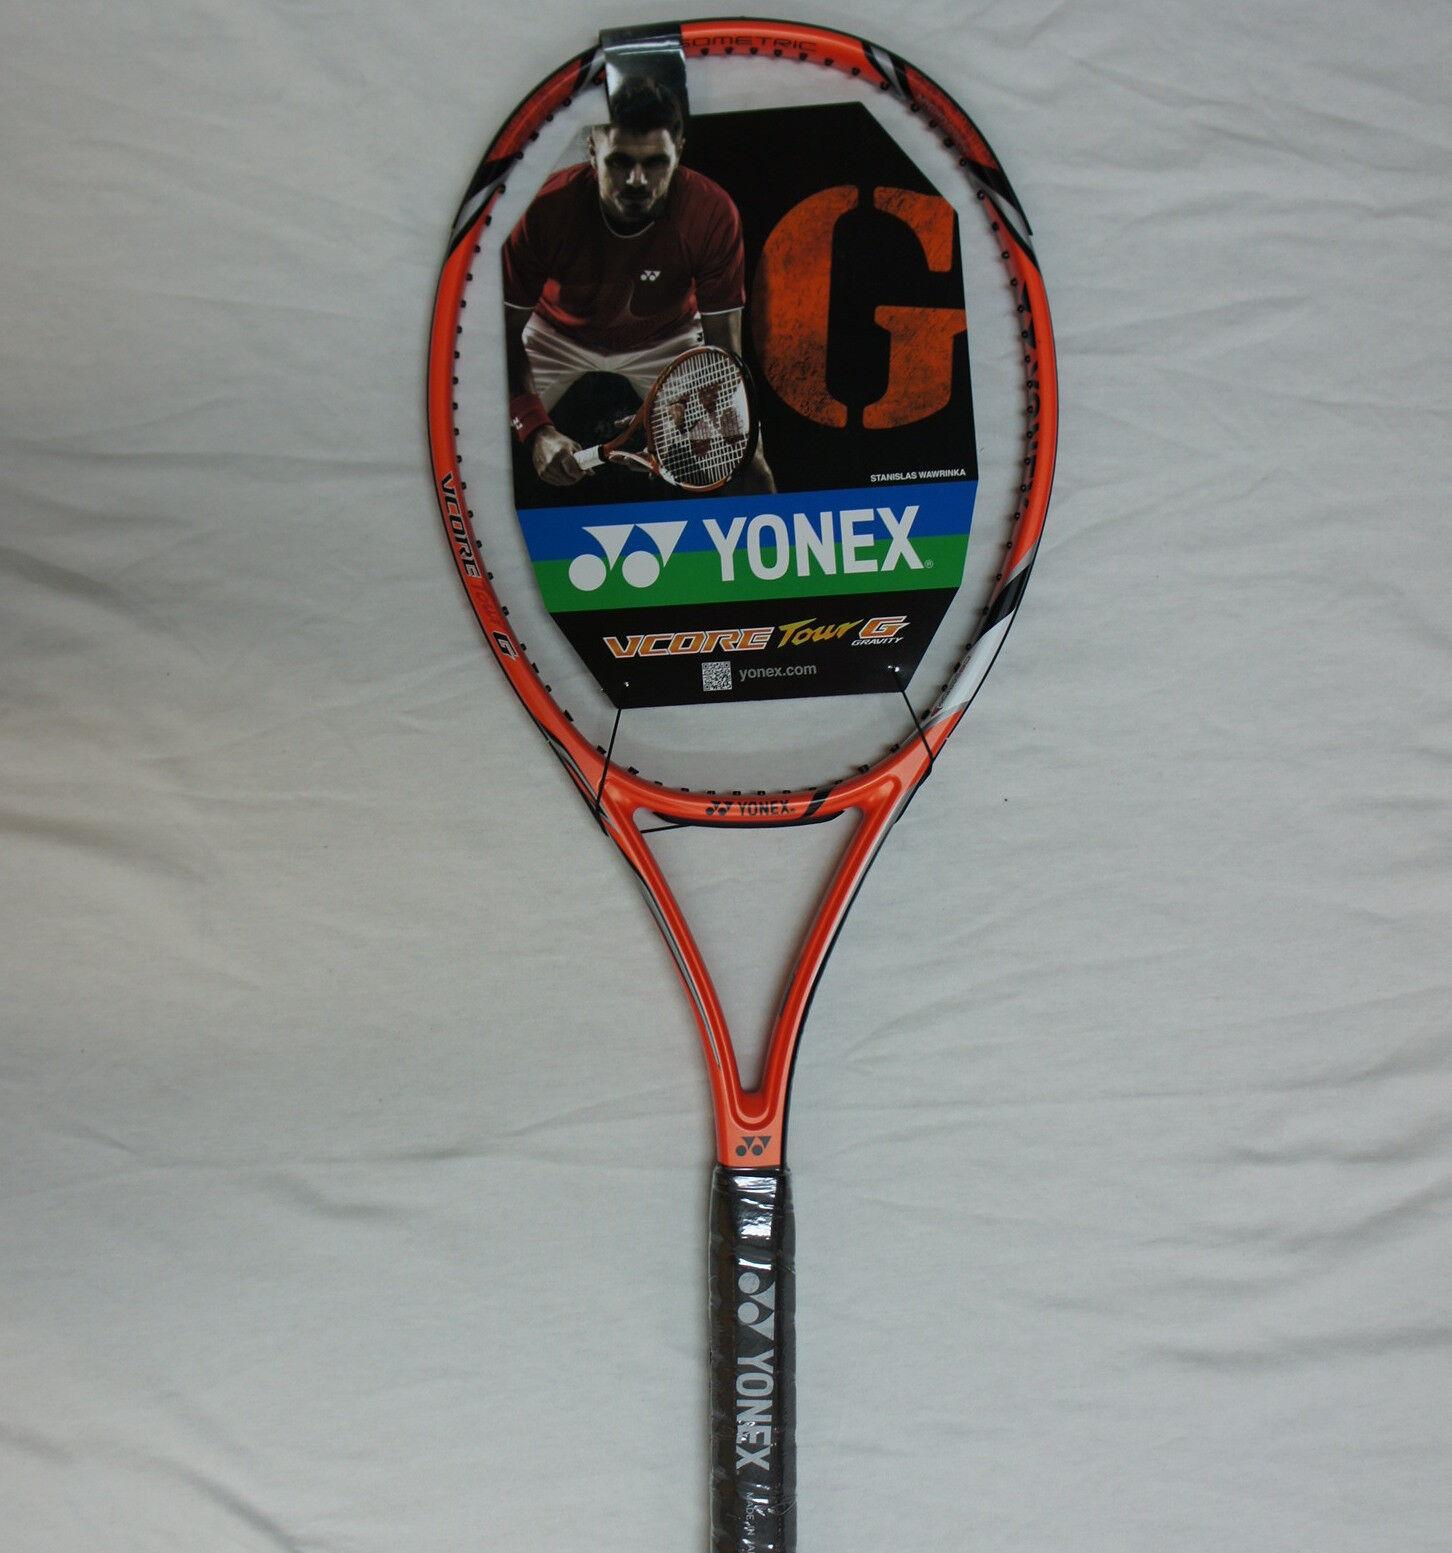 Yonex Tennis Racquet VCORE Tour G, G2, Hard-Hitting w Max Control & Spin, Strung